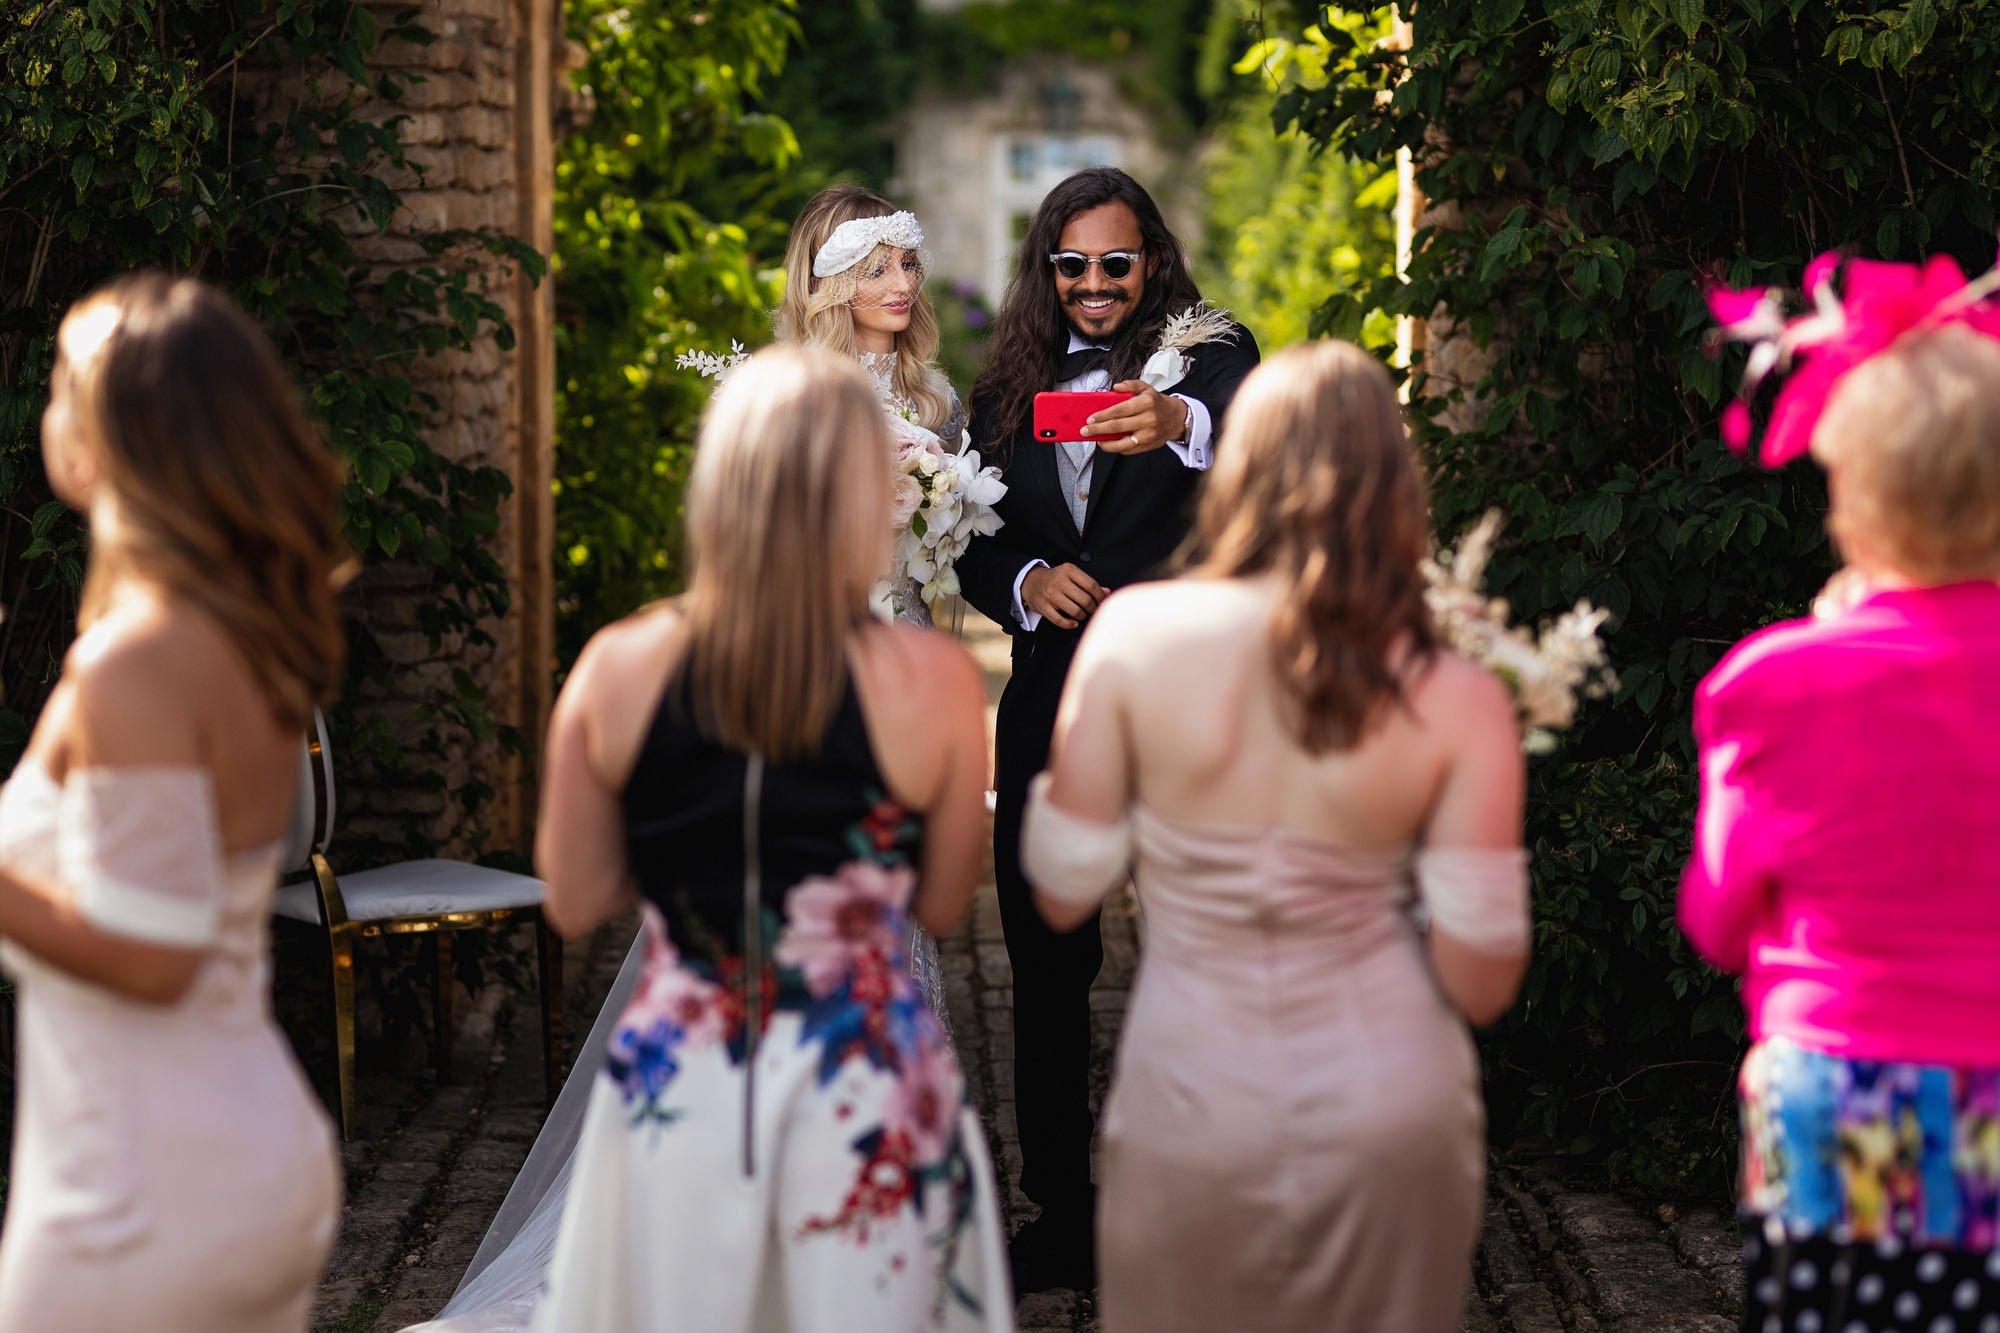 Euridge Manor, Cotswolds, civil ceremony, bride and groom, live stream, Cotswolds wedding photographer